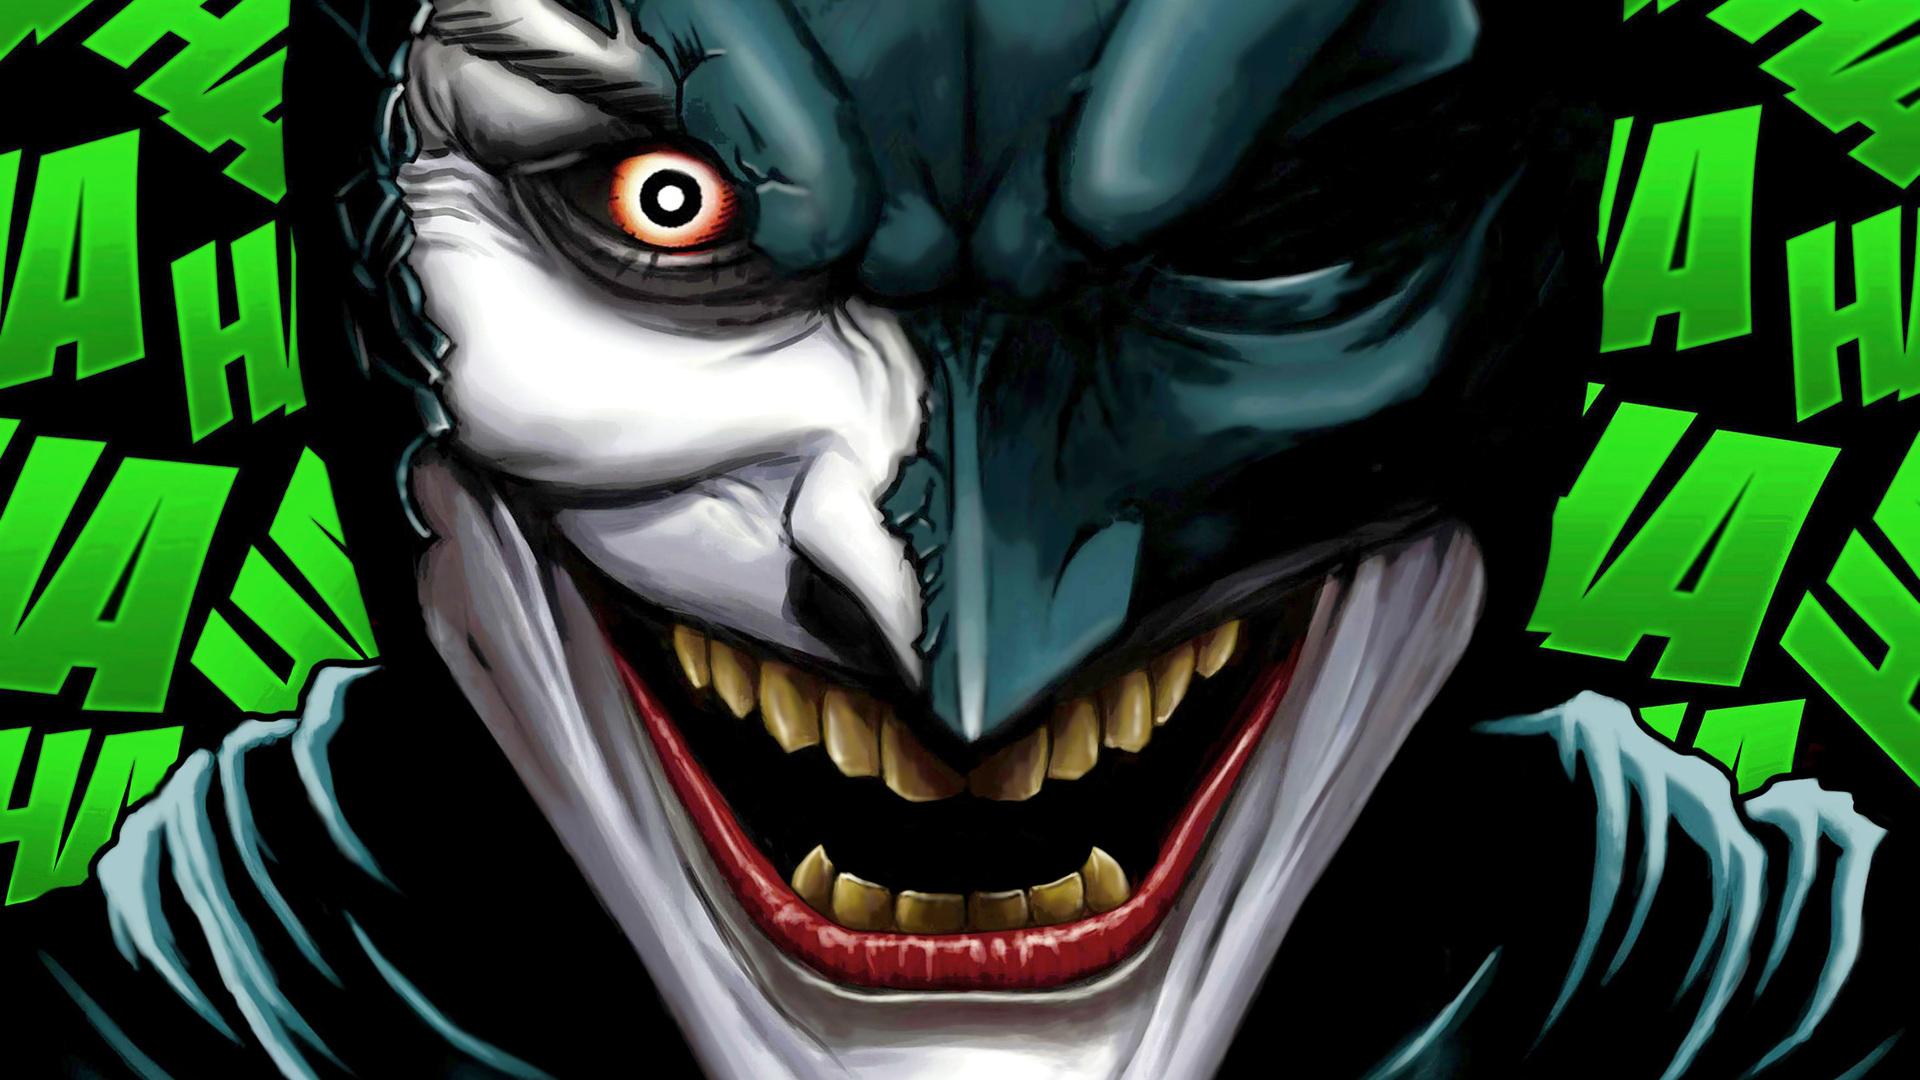 1920x1080 Joker Batman Artwork Laptop Full HD 1080P HD 4k ...